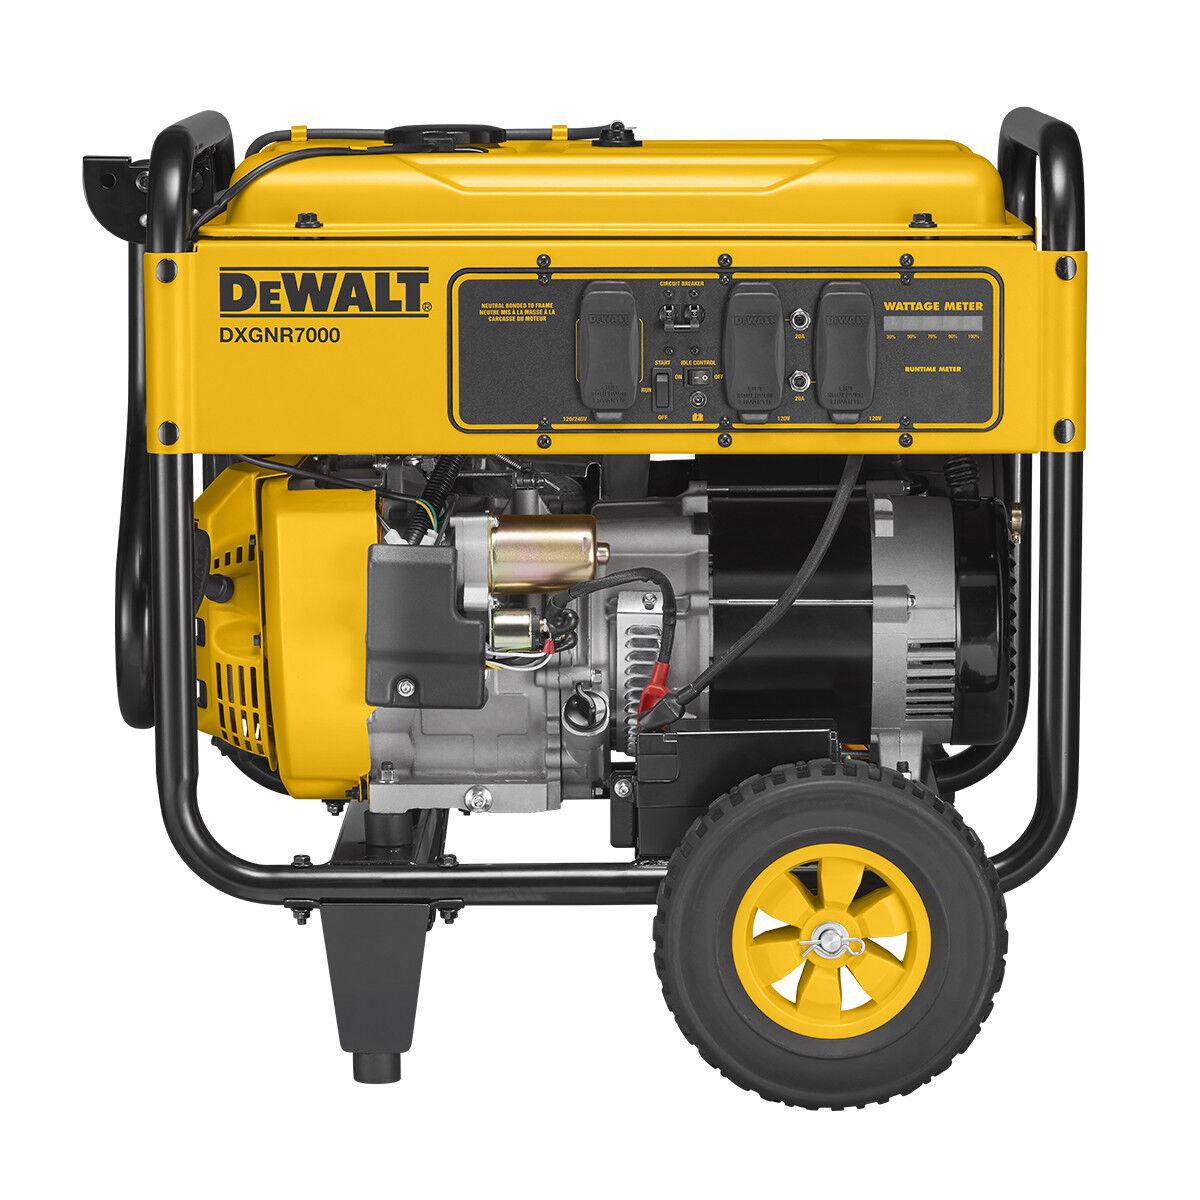 DeWALT 7000 Watt Portable Generator (reconditioned) | Electric Start | DXGNR7000